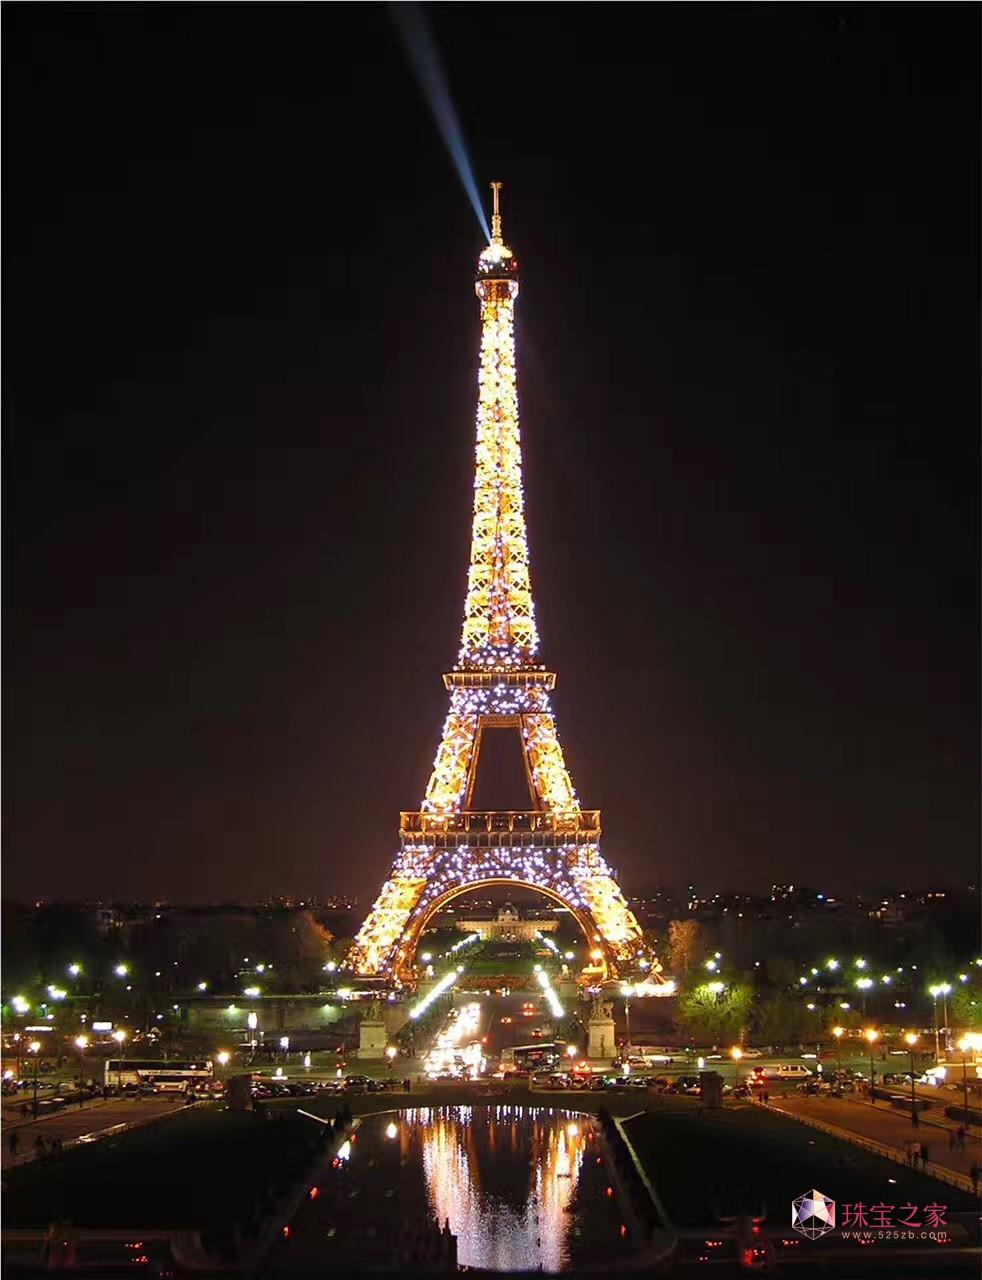 MLE超级婚戒1889巴黎全球首发,开创世界终极浪漫图片3.png